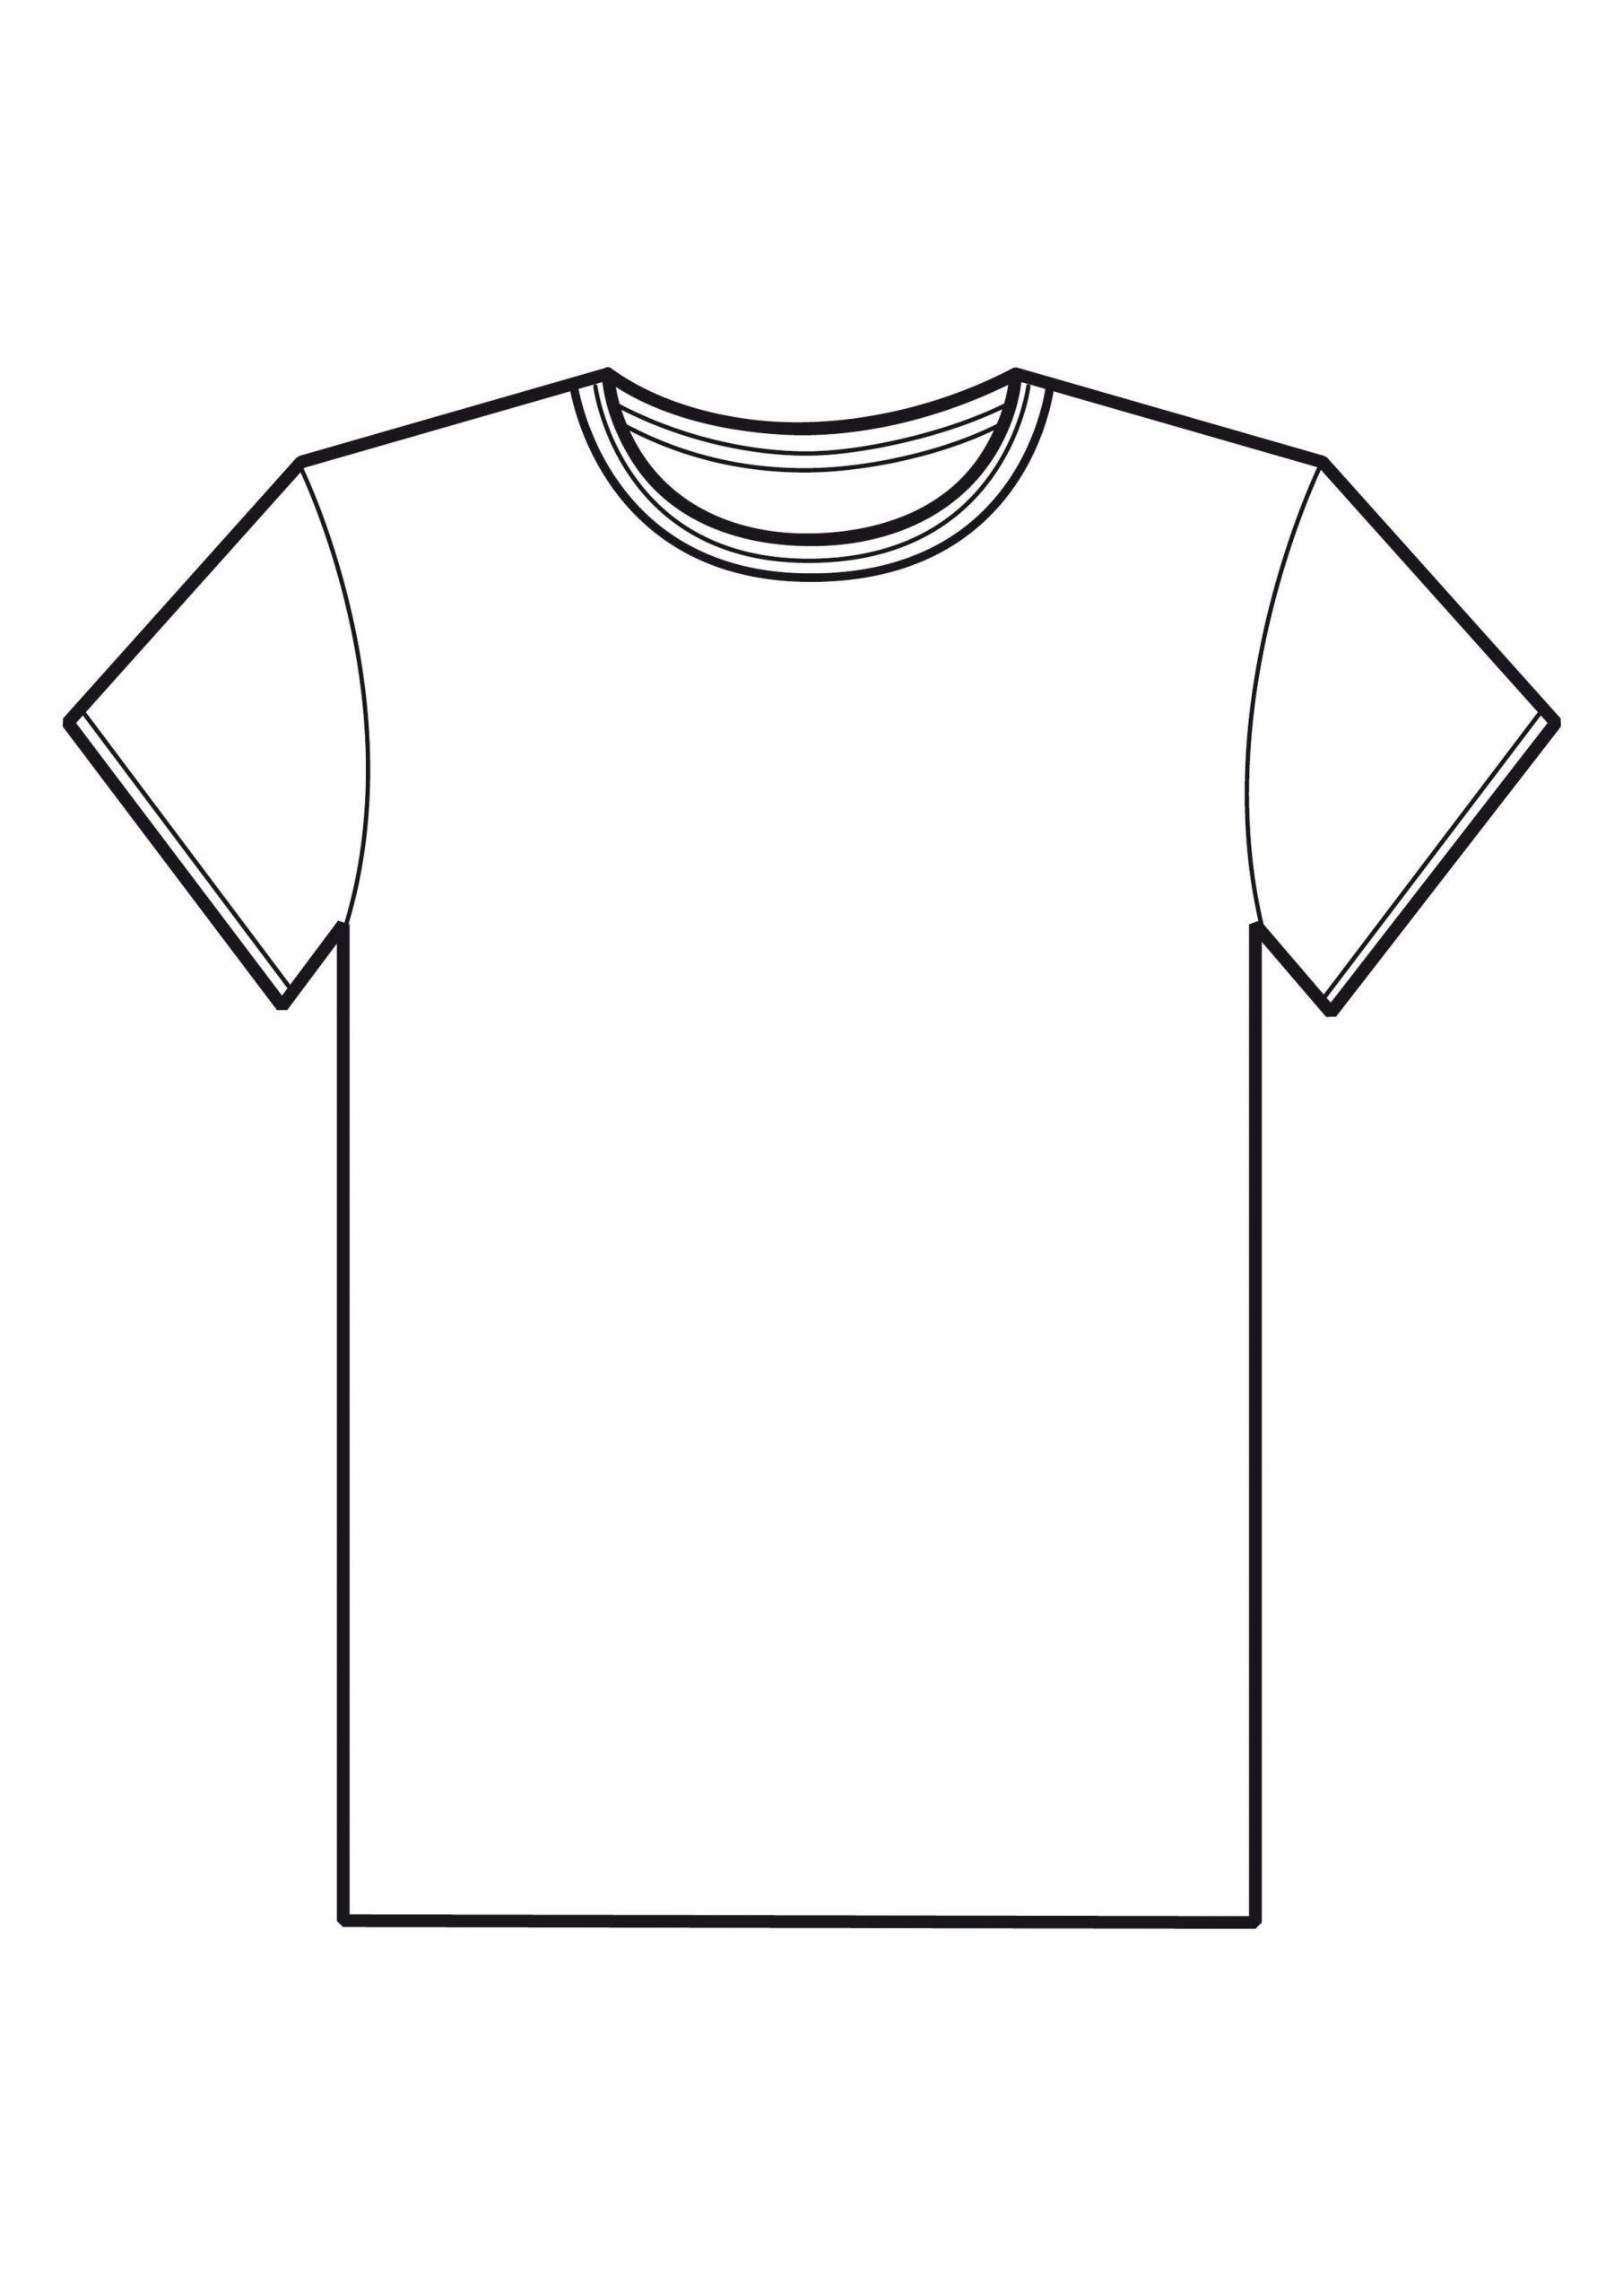 color pages ~ Color Pages Plain Tshirt Clipart Blank T Shirt.